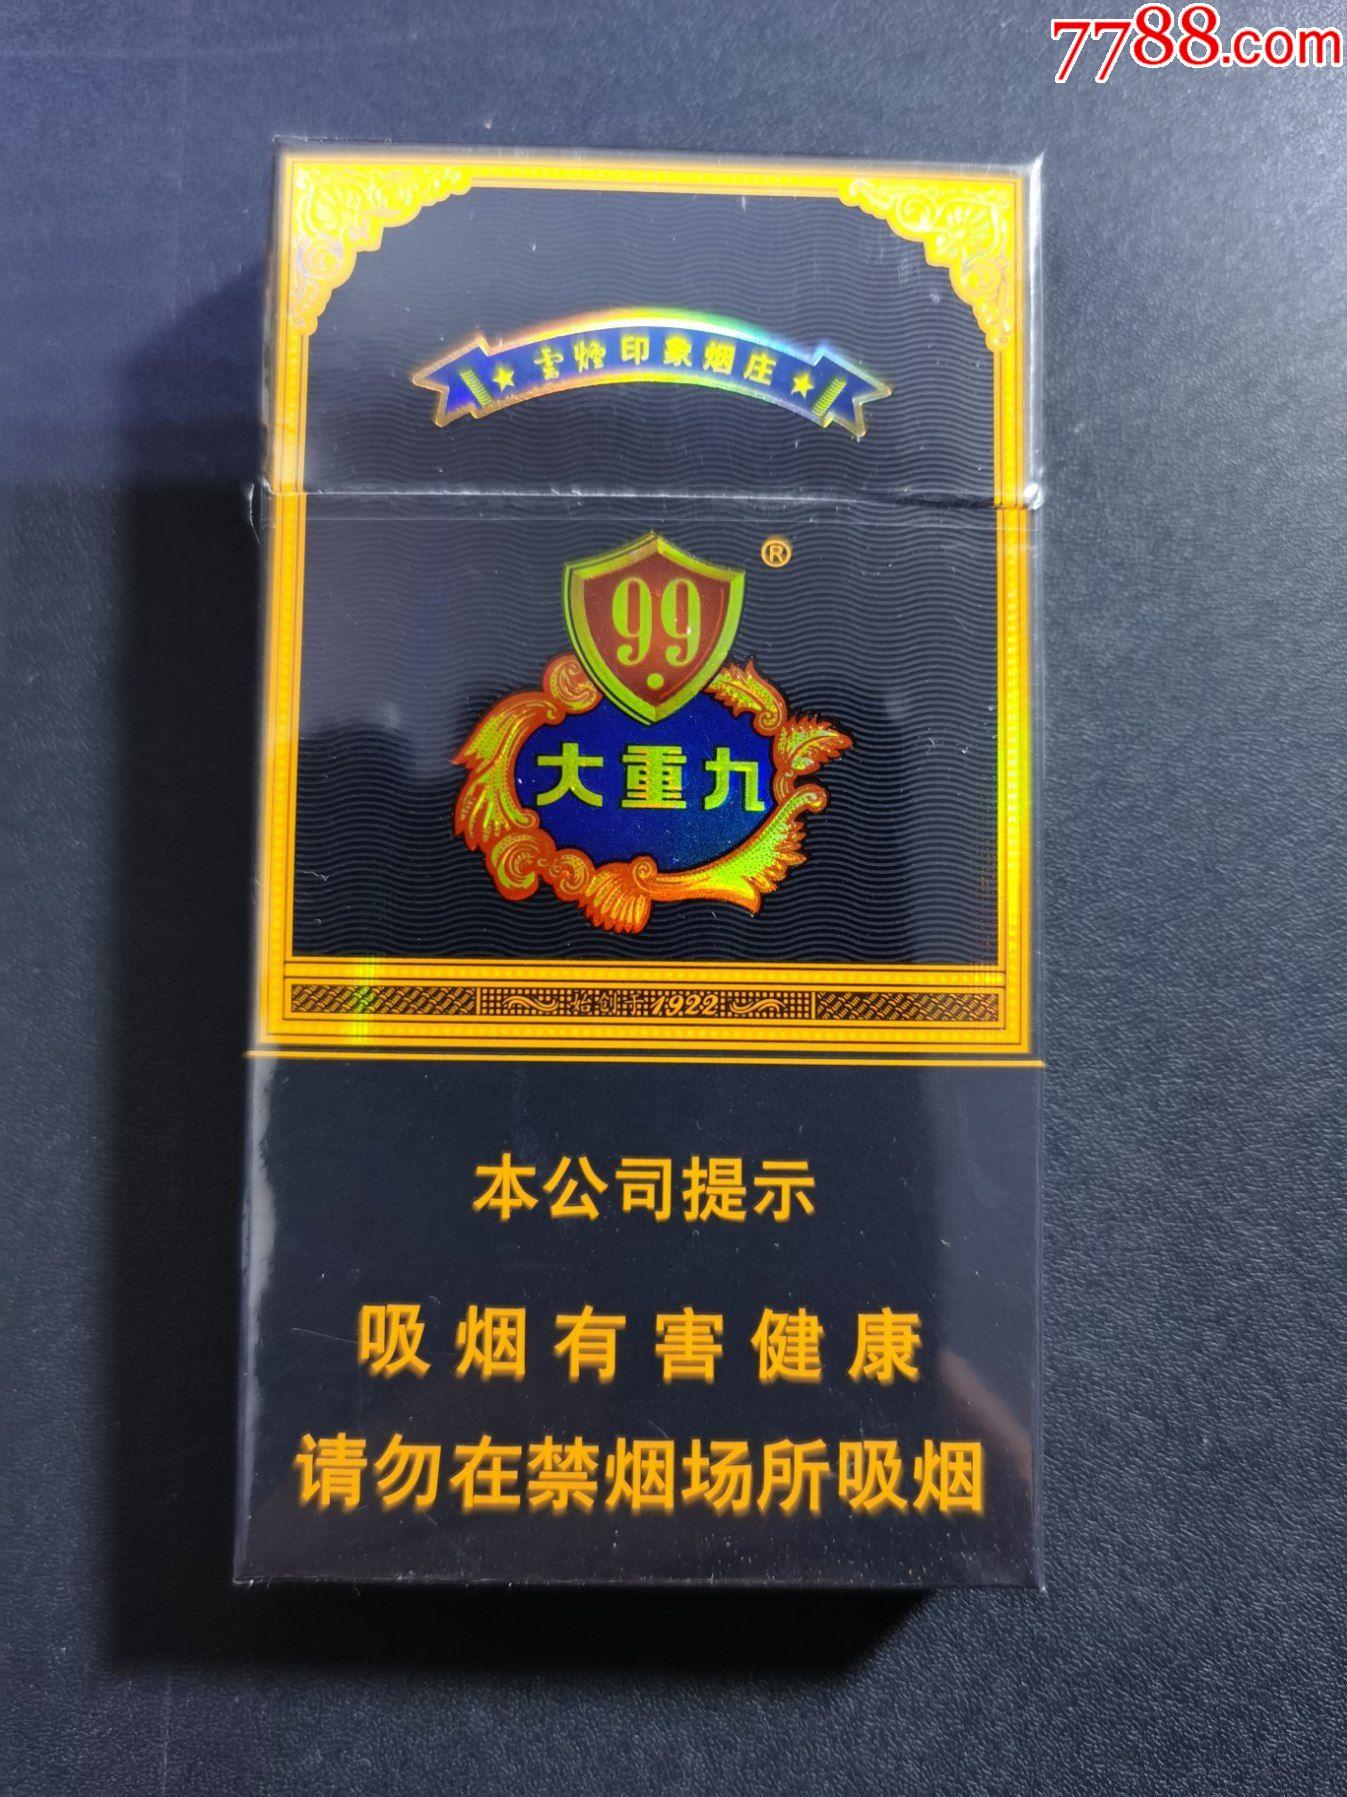 3D【大重九】非賣品;SW;多圖;云南(au24891972)_7788舊貨商城__七七八八商品交易平臺(7788.com)